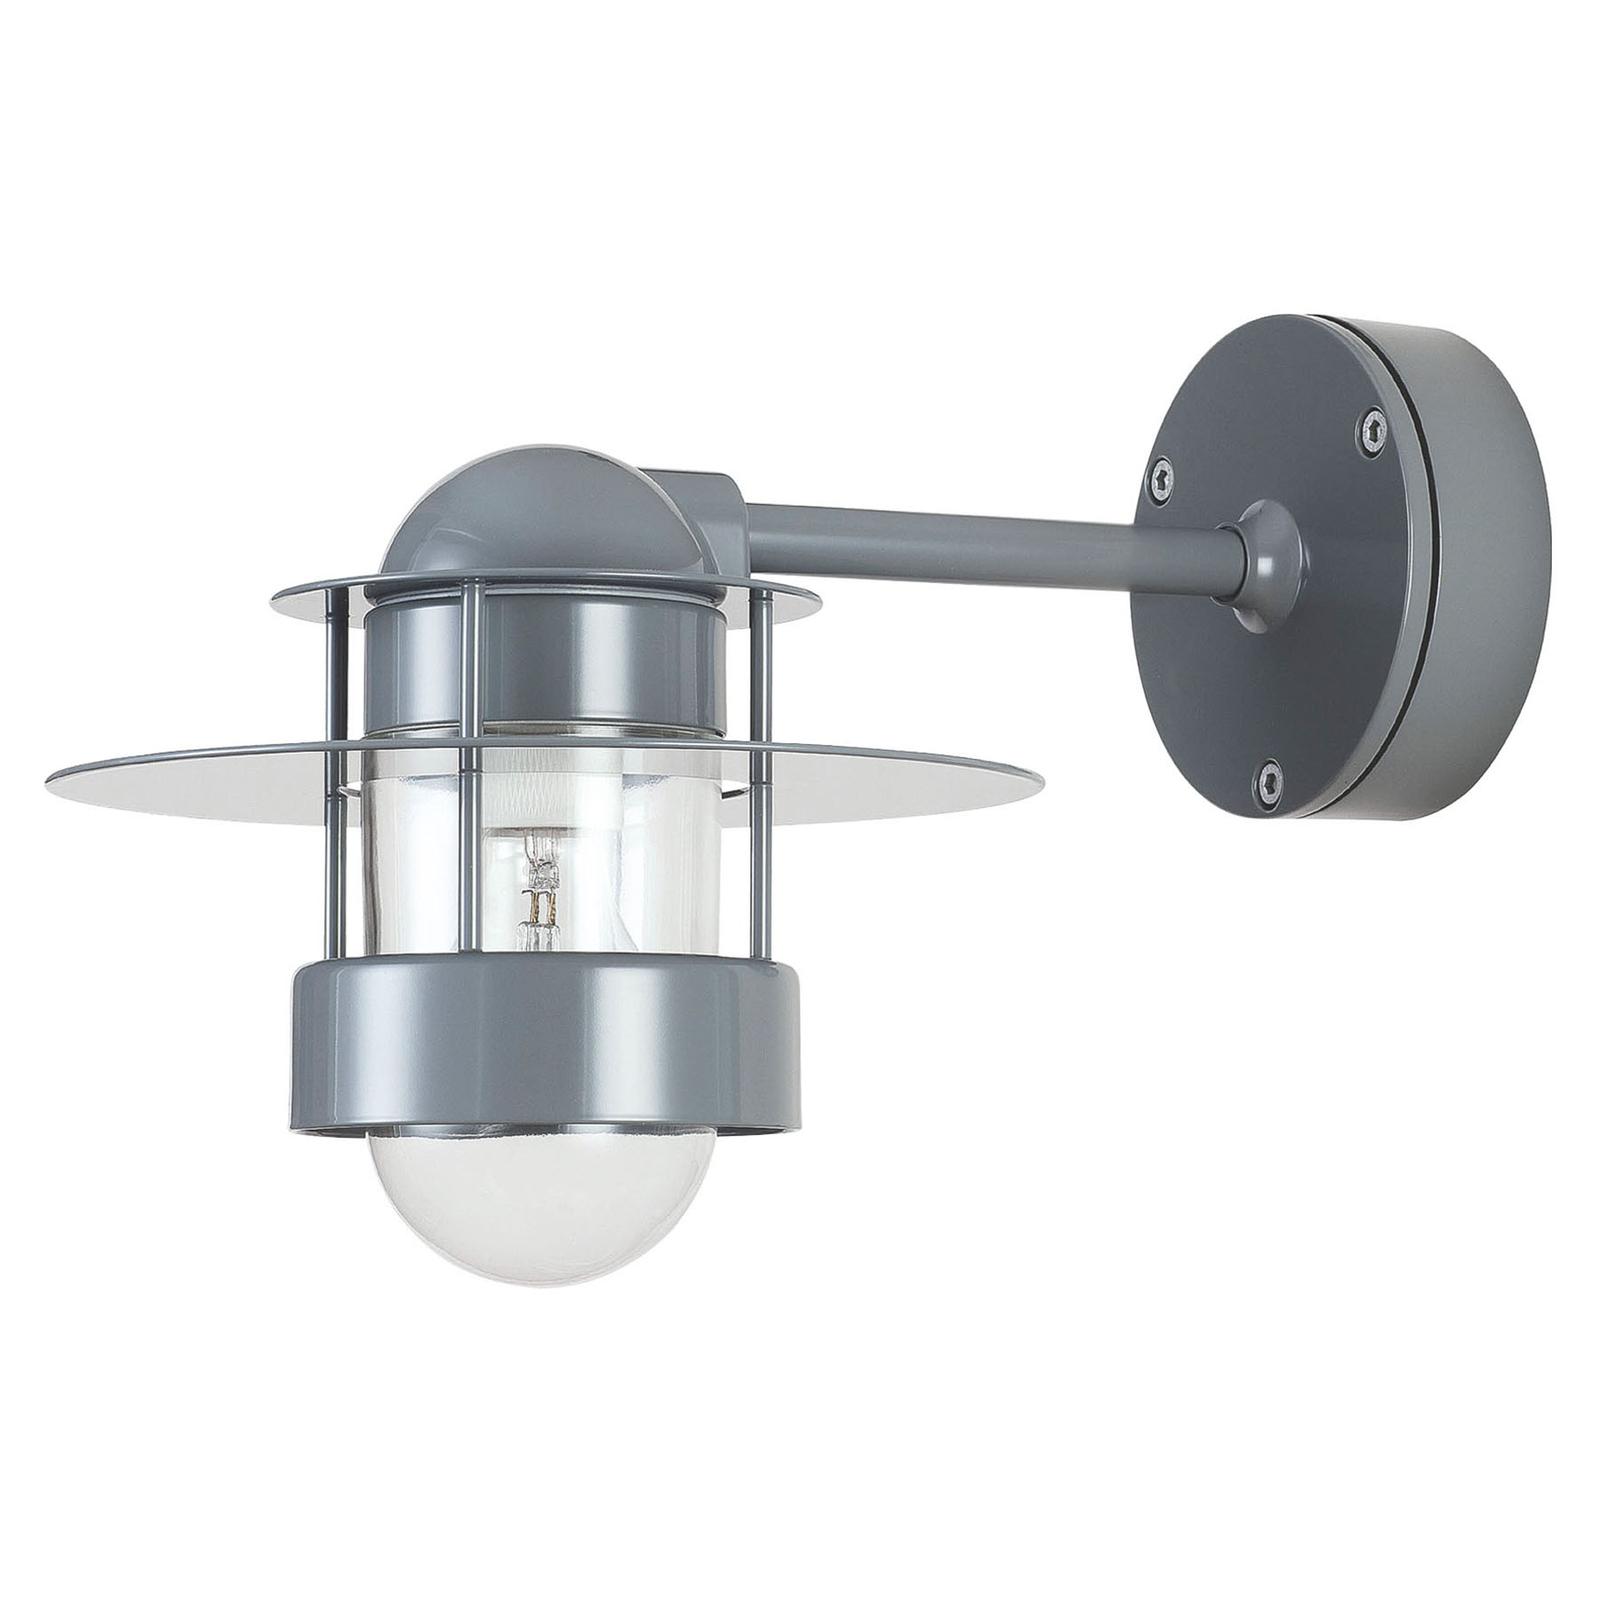 Louis Poulsen Albertslund wandlamp 41,5 cm grijs